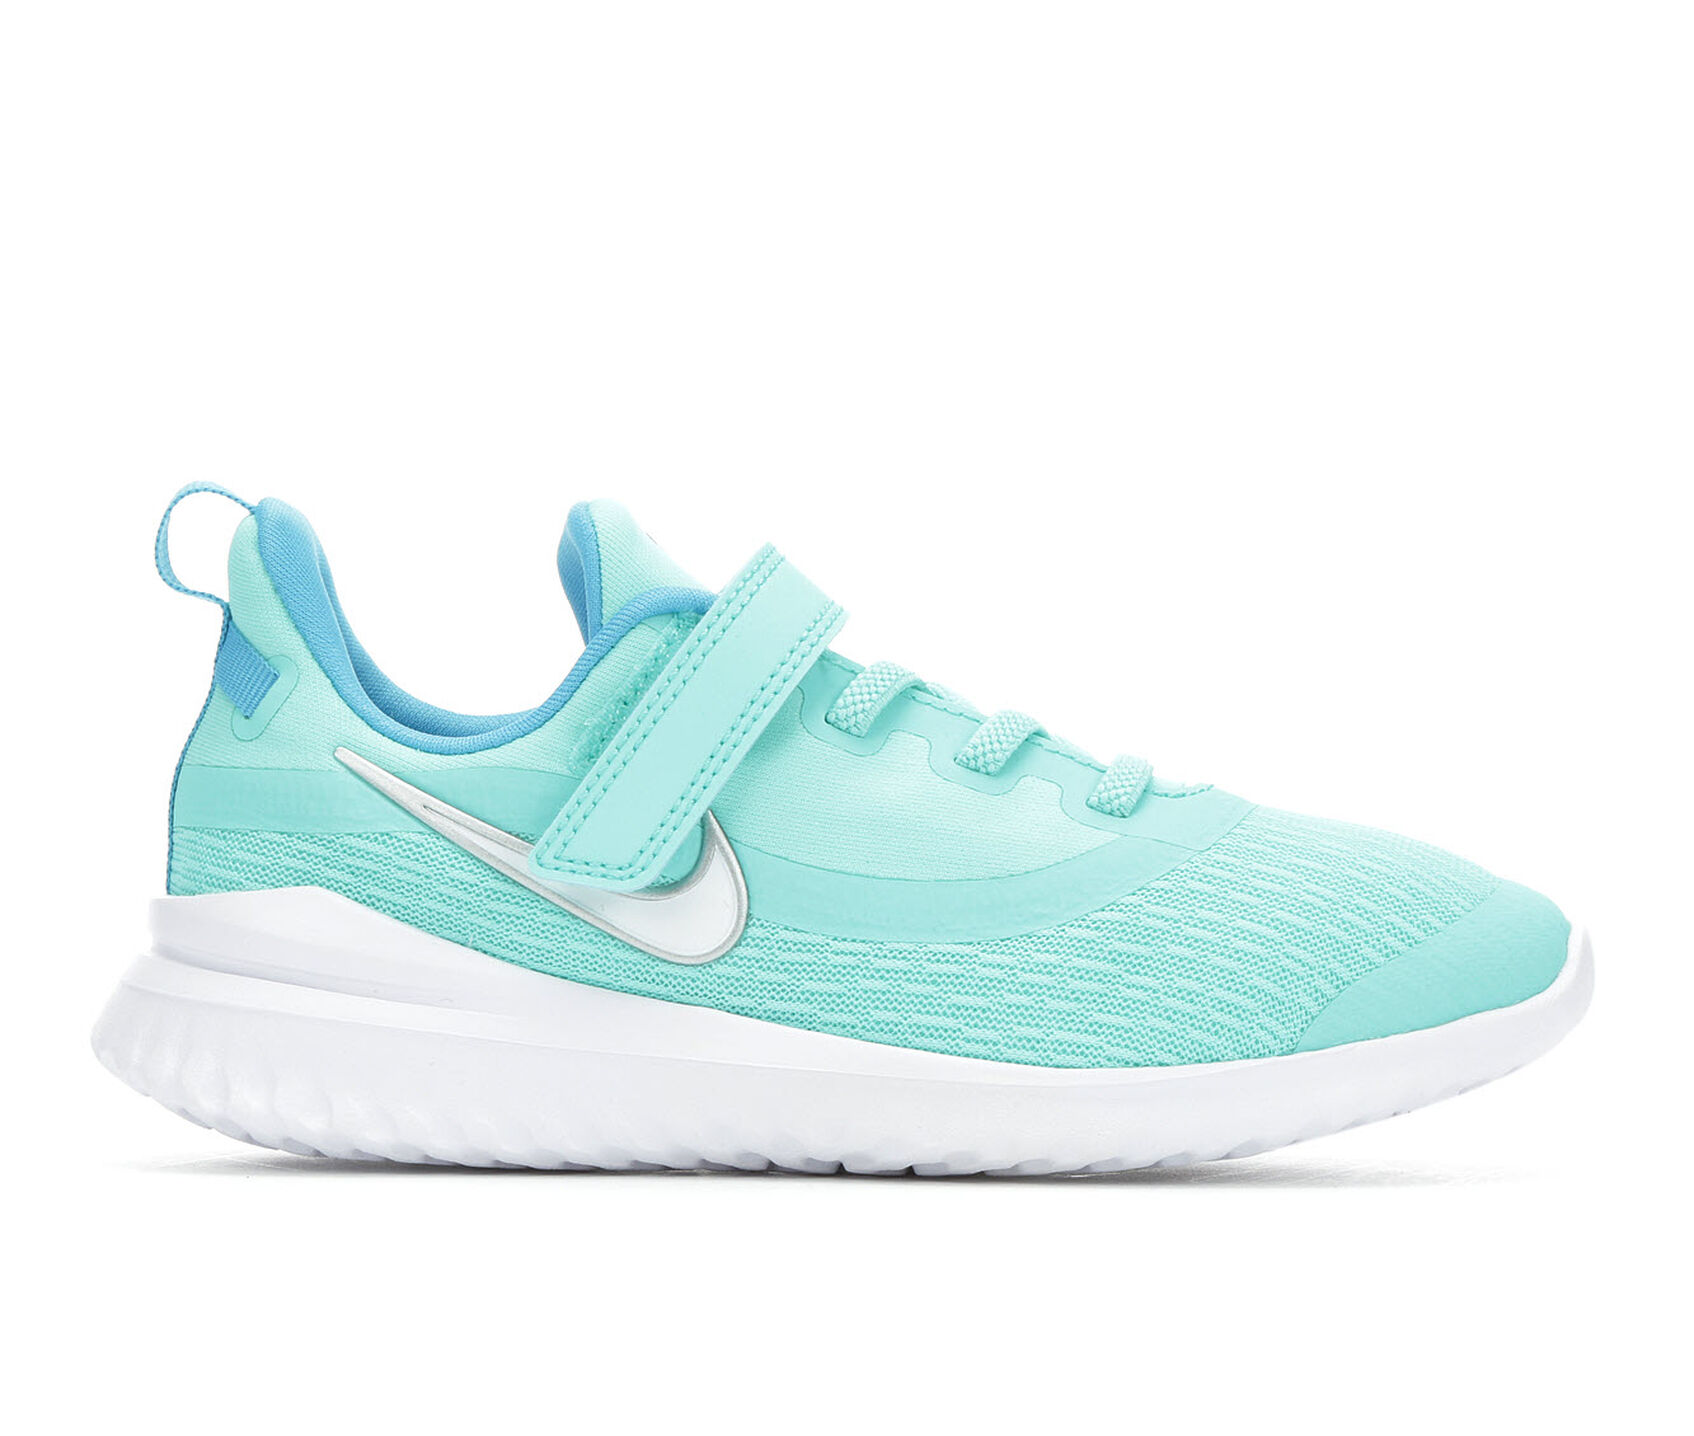 5c7b879f Girls' Nike Little Kid Renew Rival 2 Running Shoes